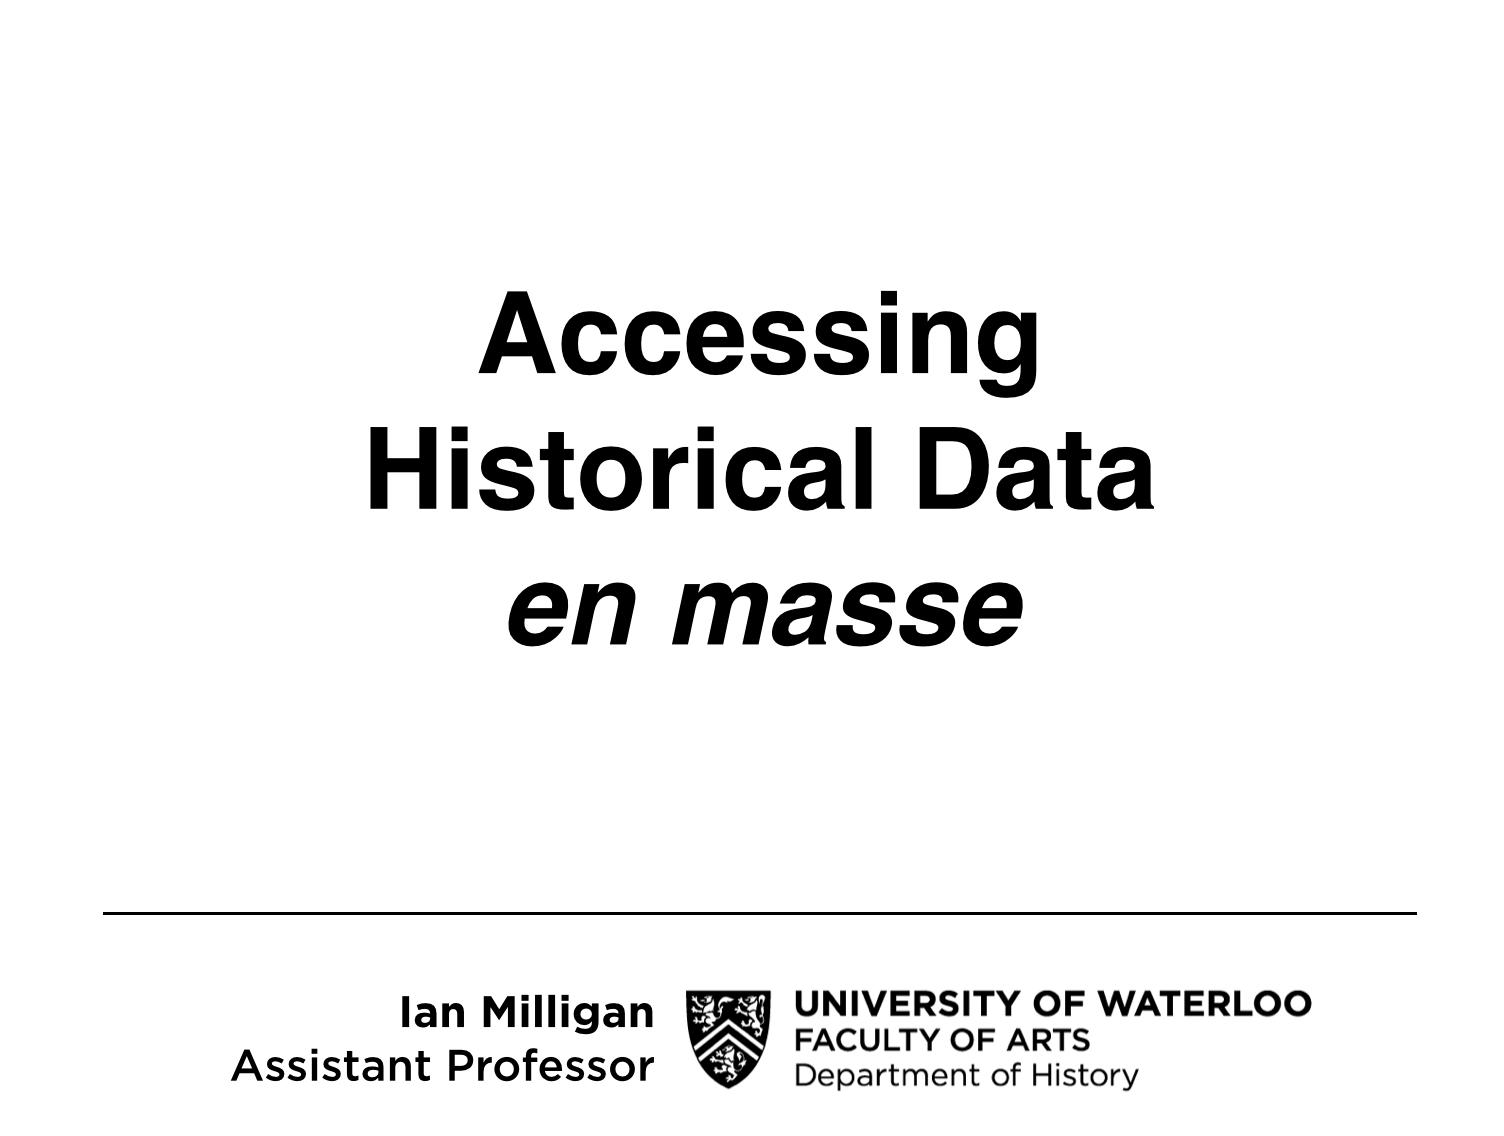 Accessing Historical Data En Masse – Ian Milligan